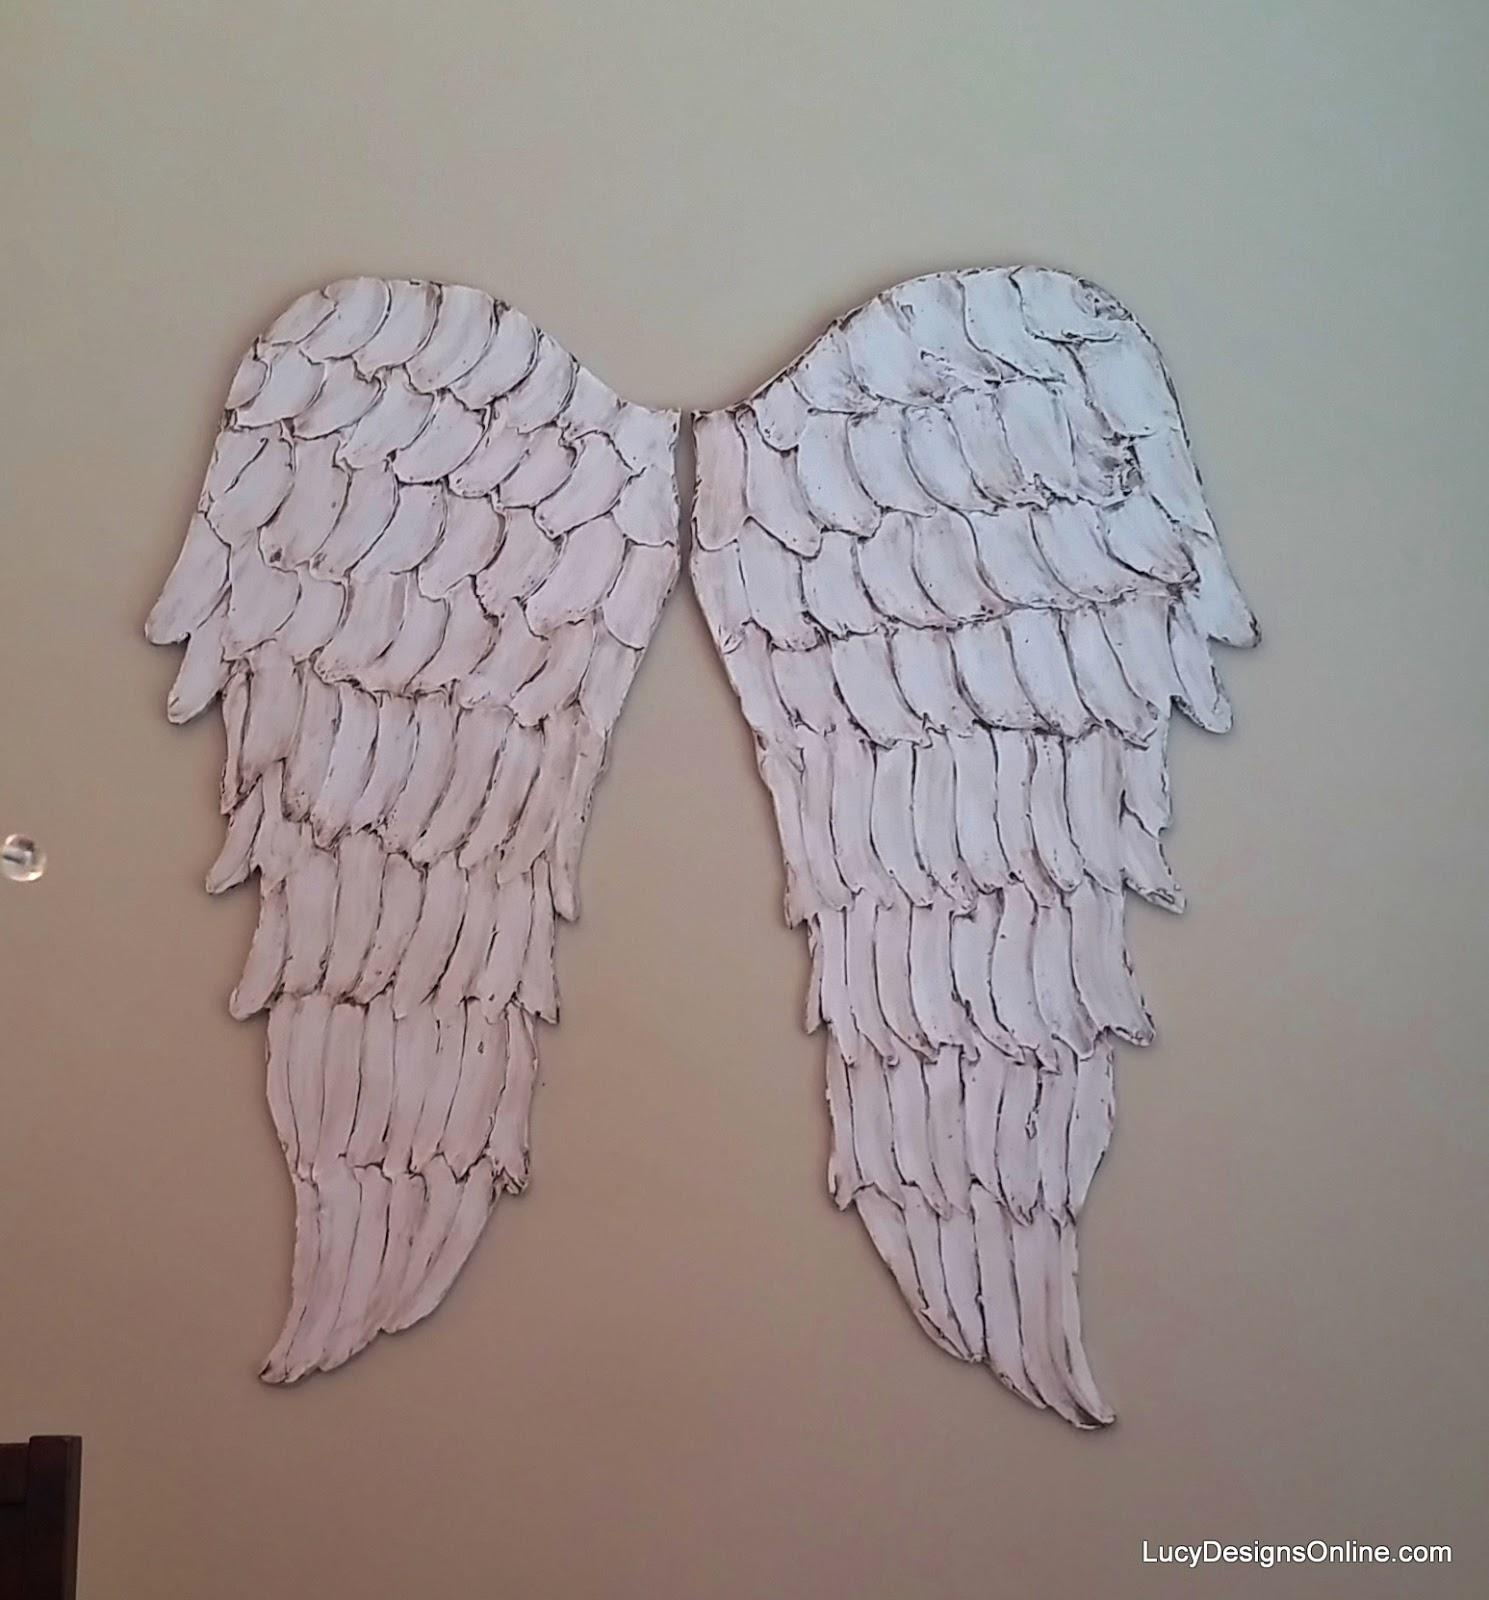 Wood Angel Wings Wall Art, Large Carved Look Wooden Angel Wings Throughout Angel Wing Wall Art (View 15 of 20)